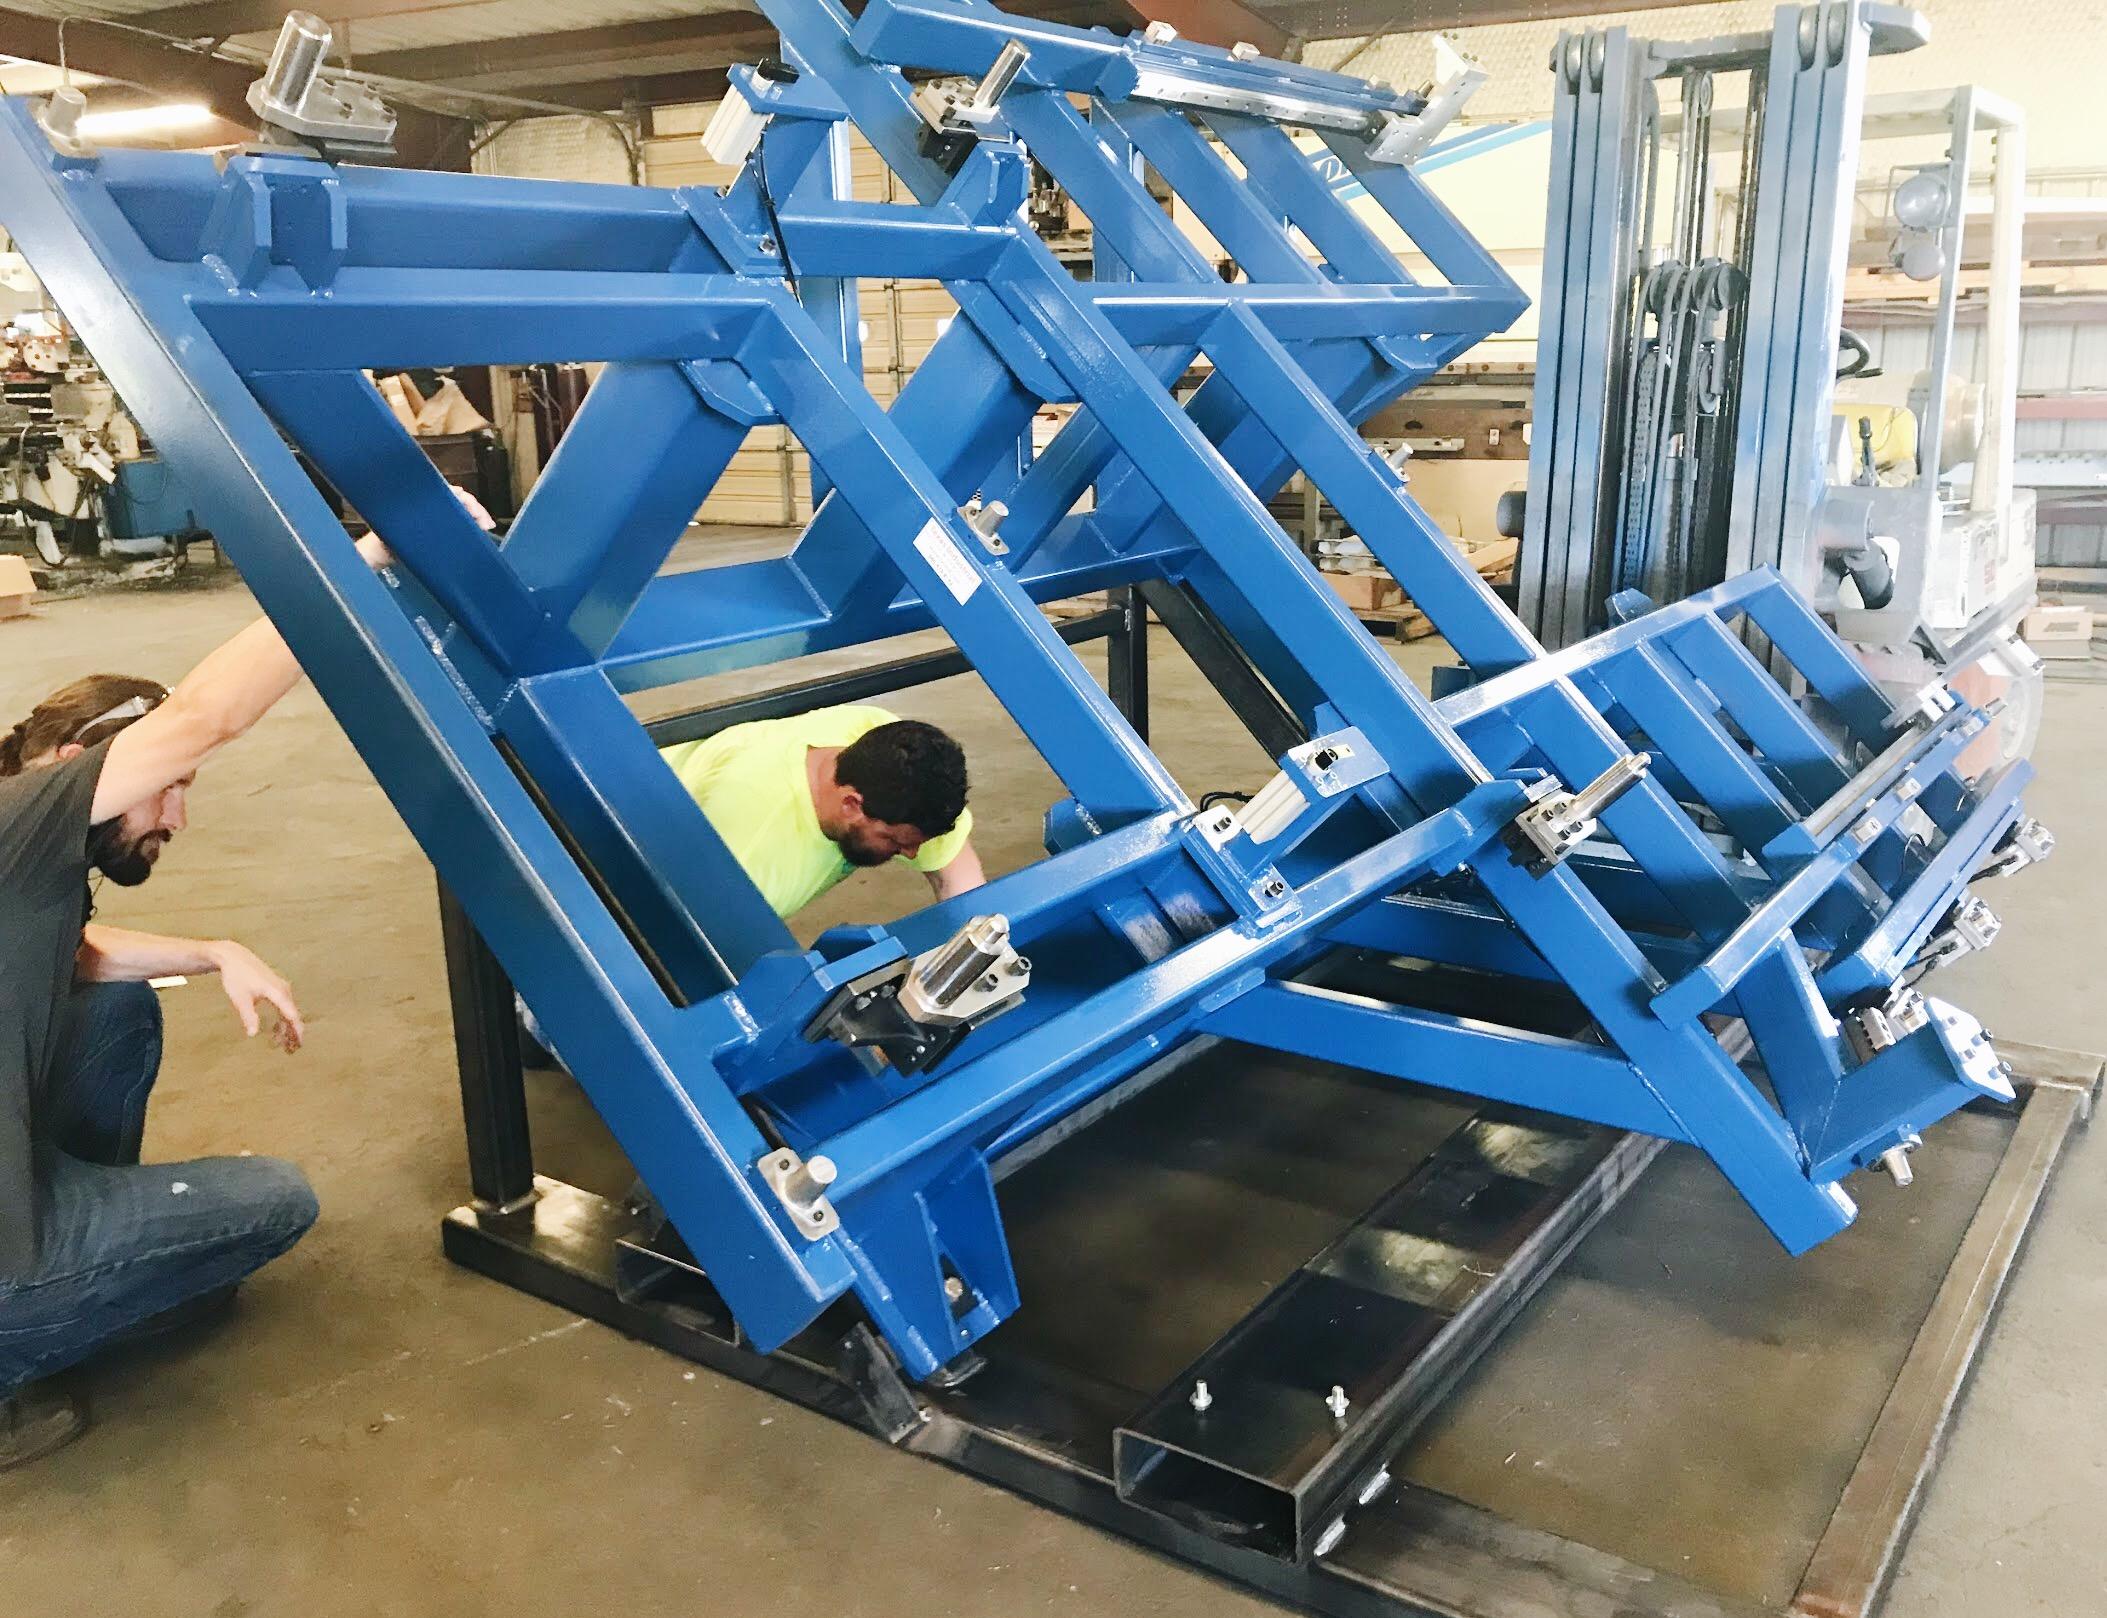 assembly fixtures texas industrial machine & design 8.jpg